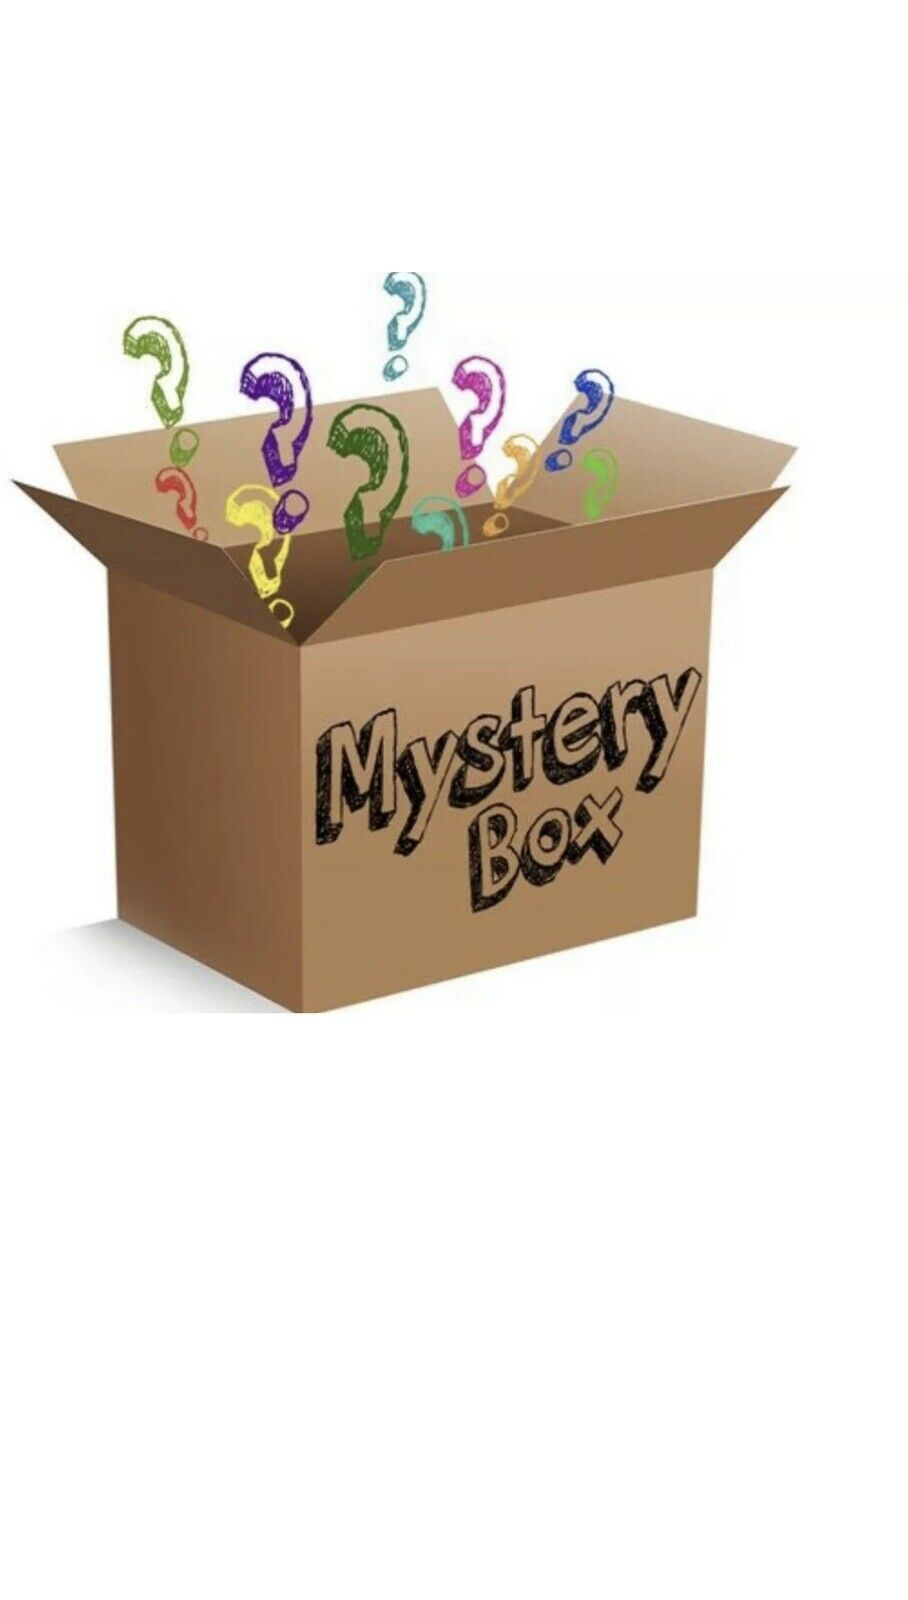 500 Surprise Box Surprise Box Ideas Of Surprise Box Surprisebox 500 Surprise Box Price 256 80 Surprise Box Box Mystery Box